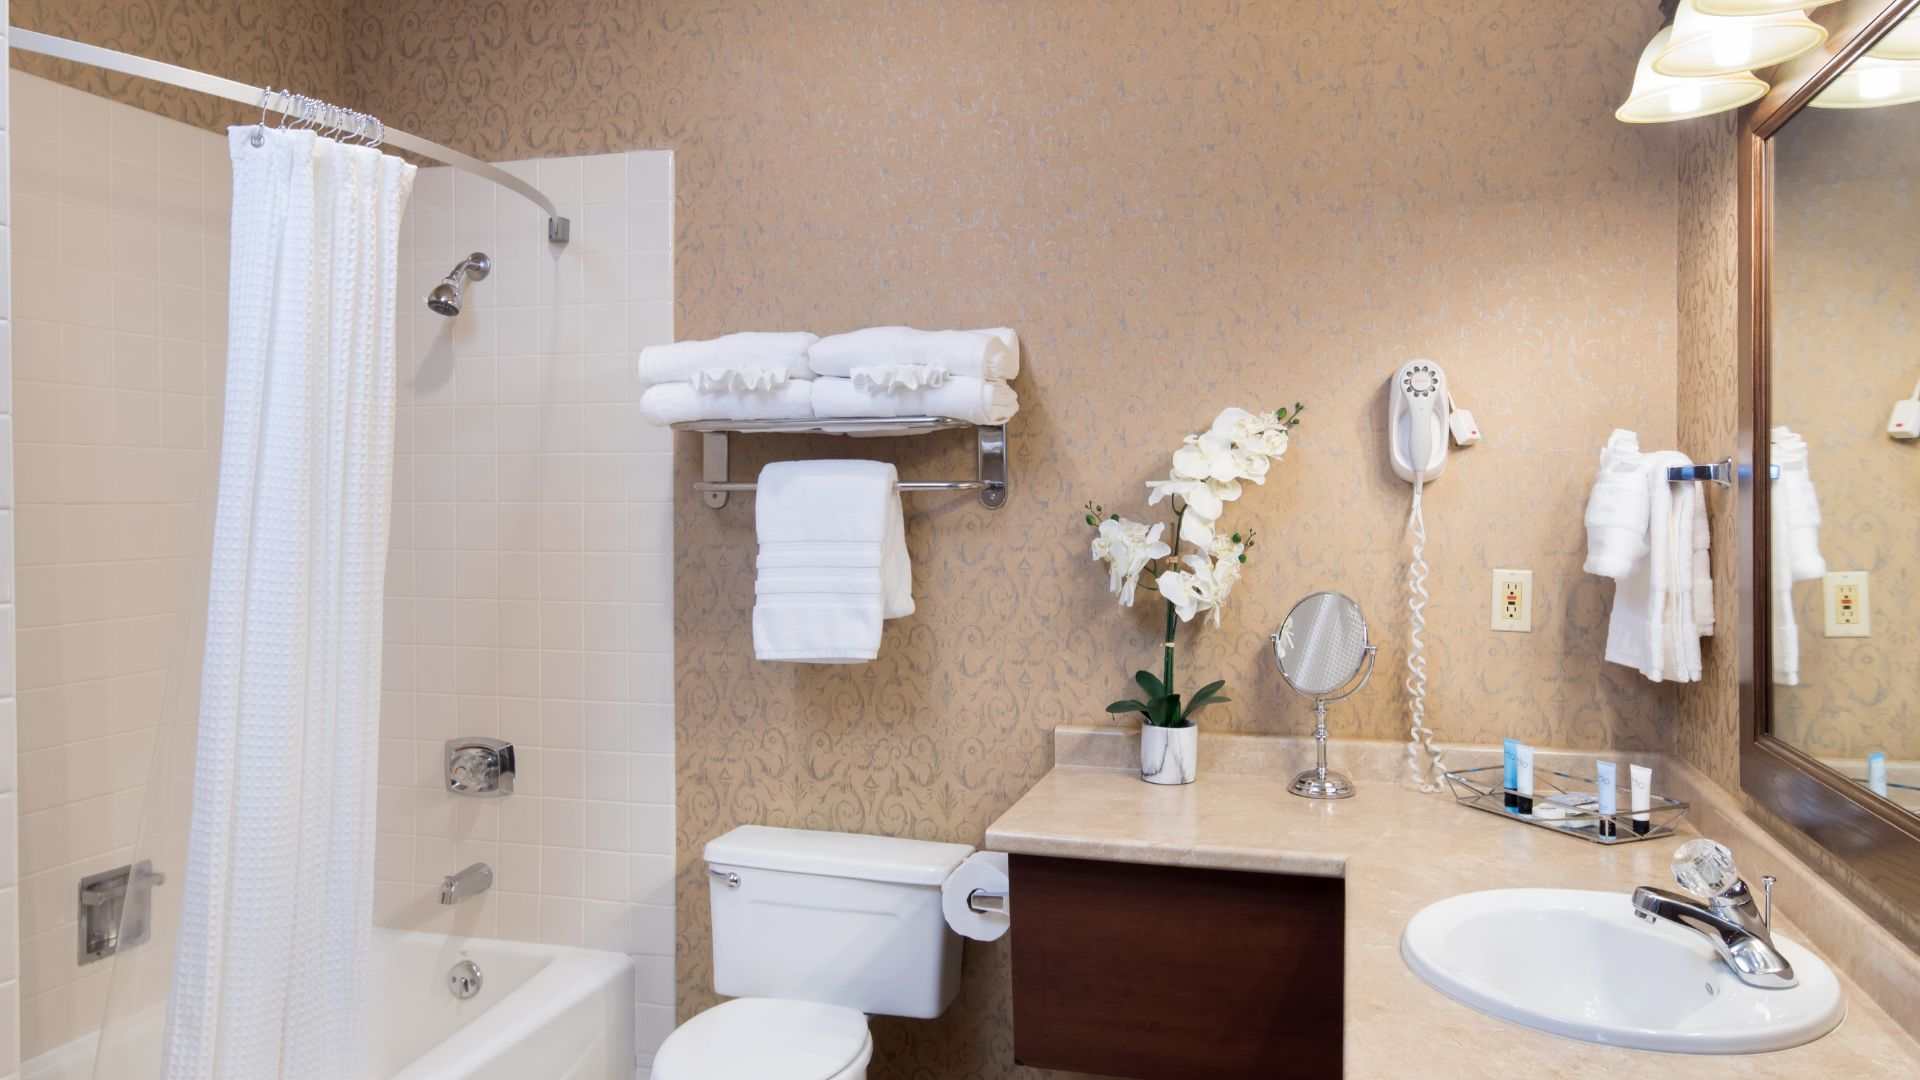 Rapid City SD Hotels: Grand Gateway Hotel Black Hills Rapid City Rapid City South Dakota ...